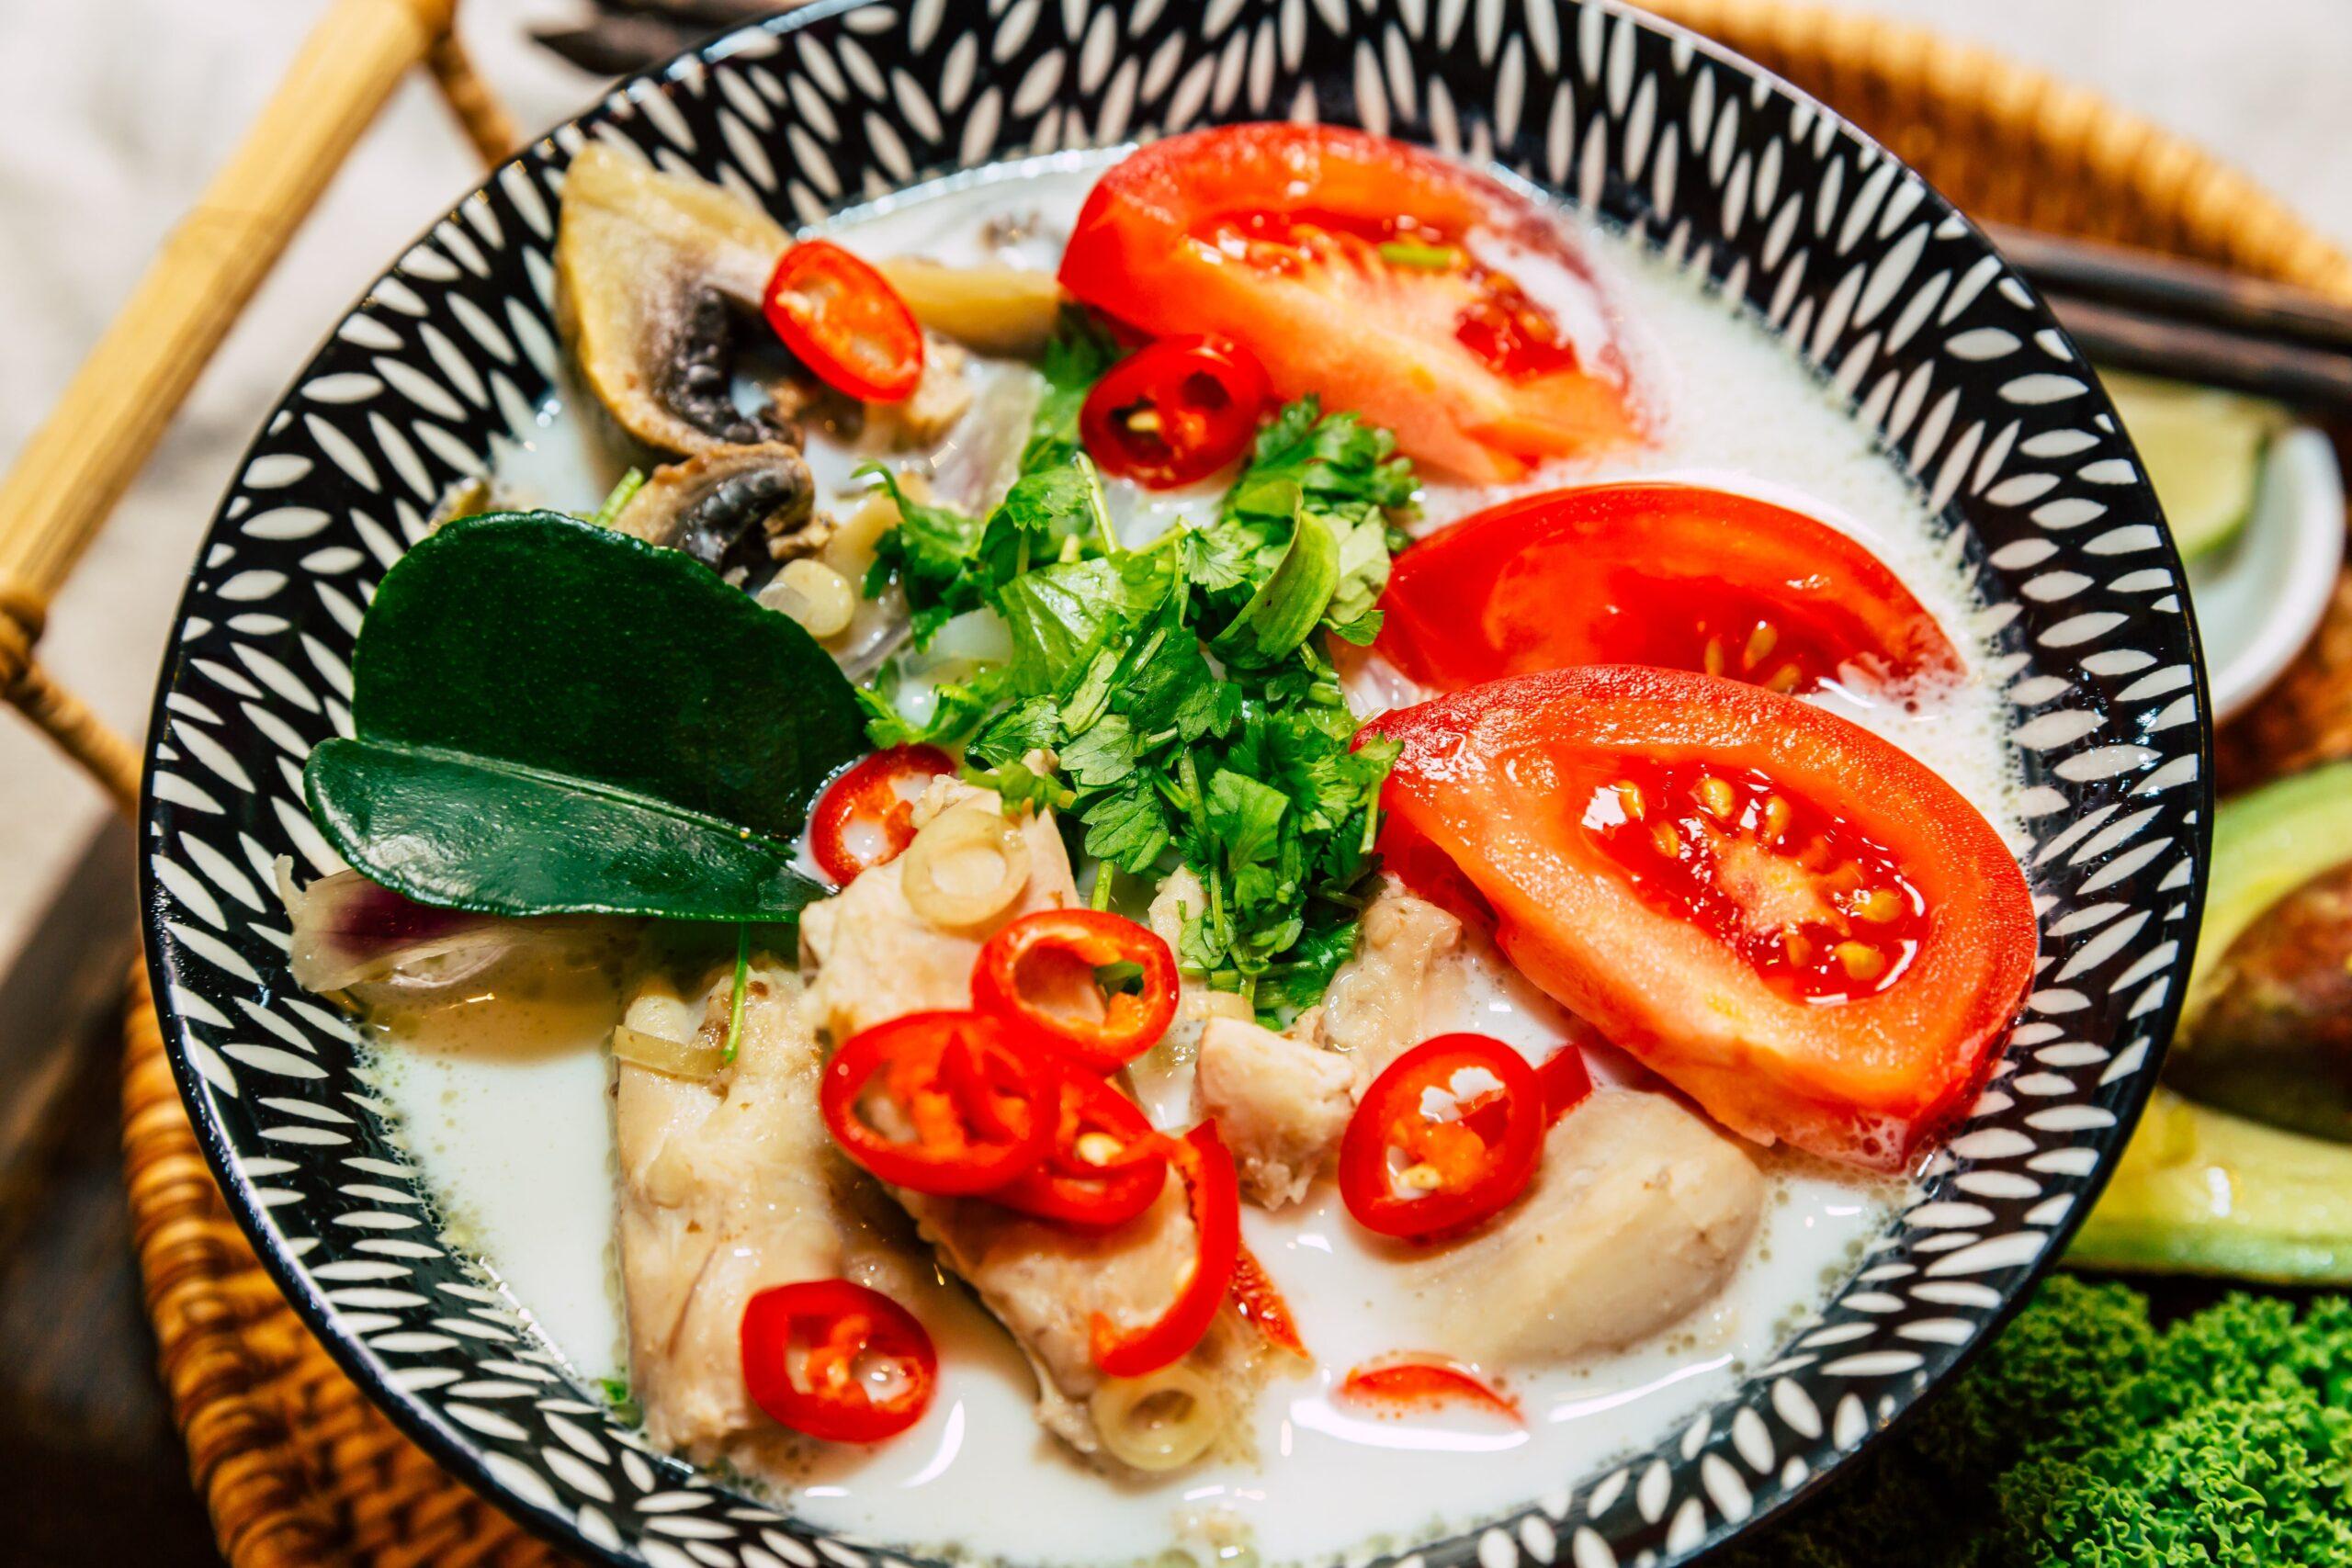 Keto Tom-Kha Shirataki Noodle Soup with Chicken